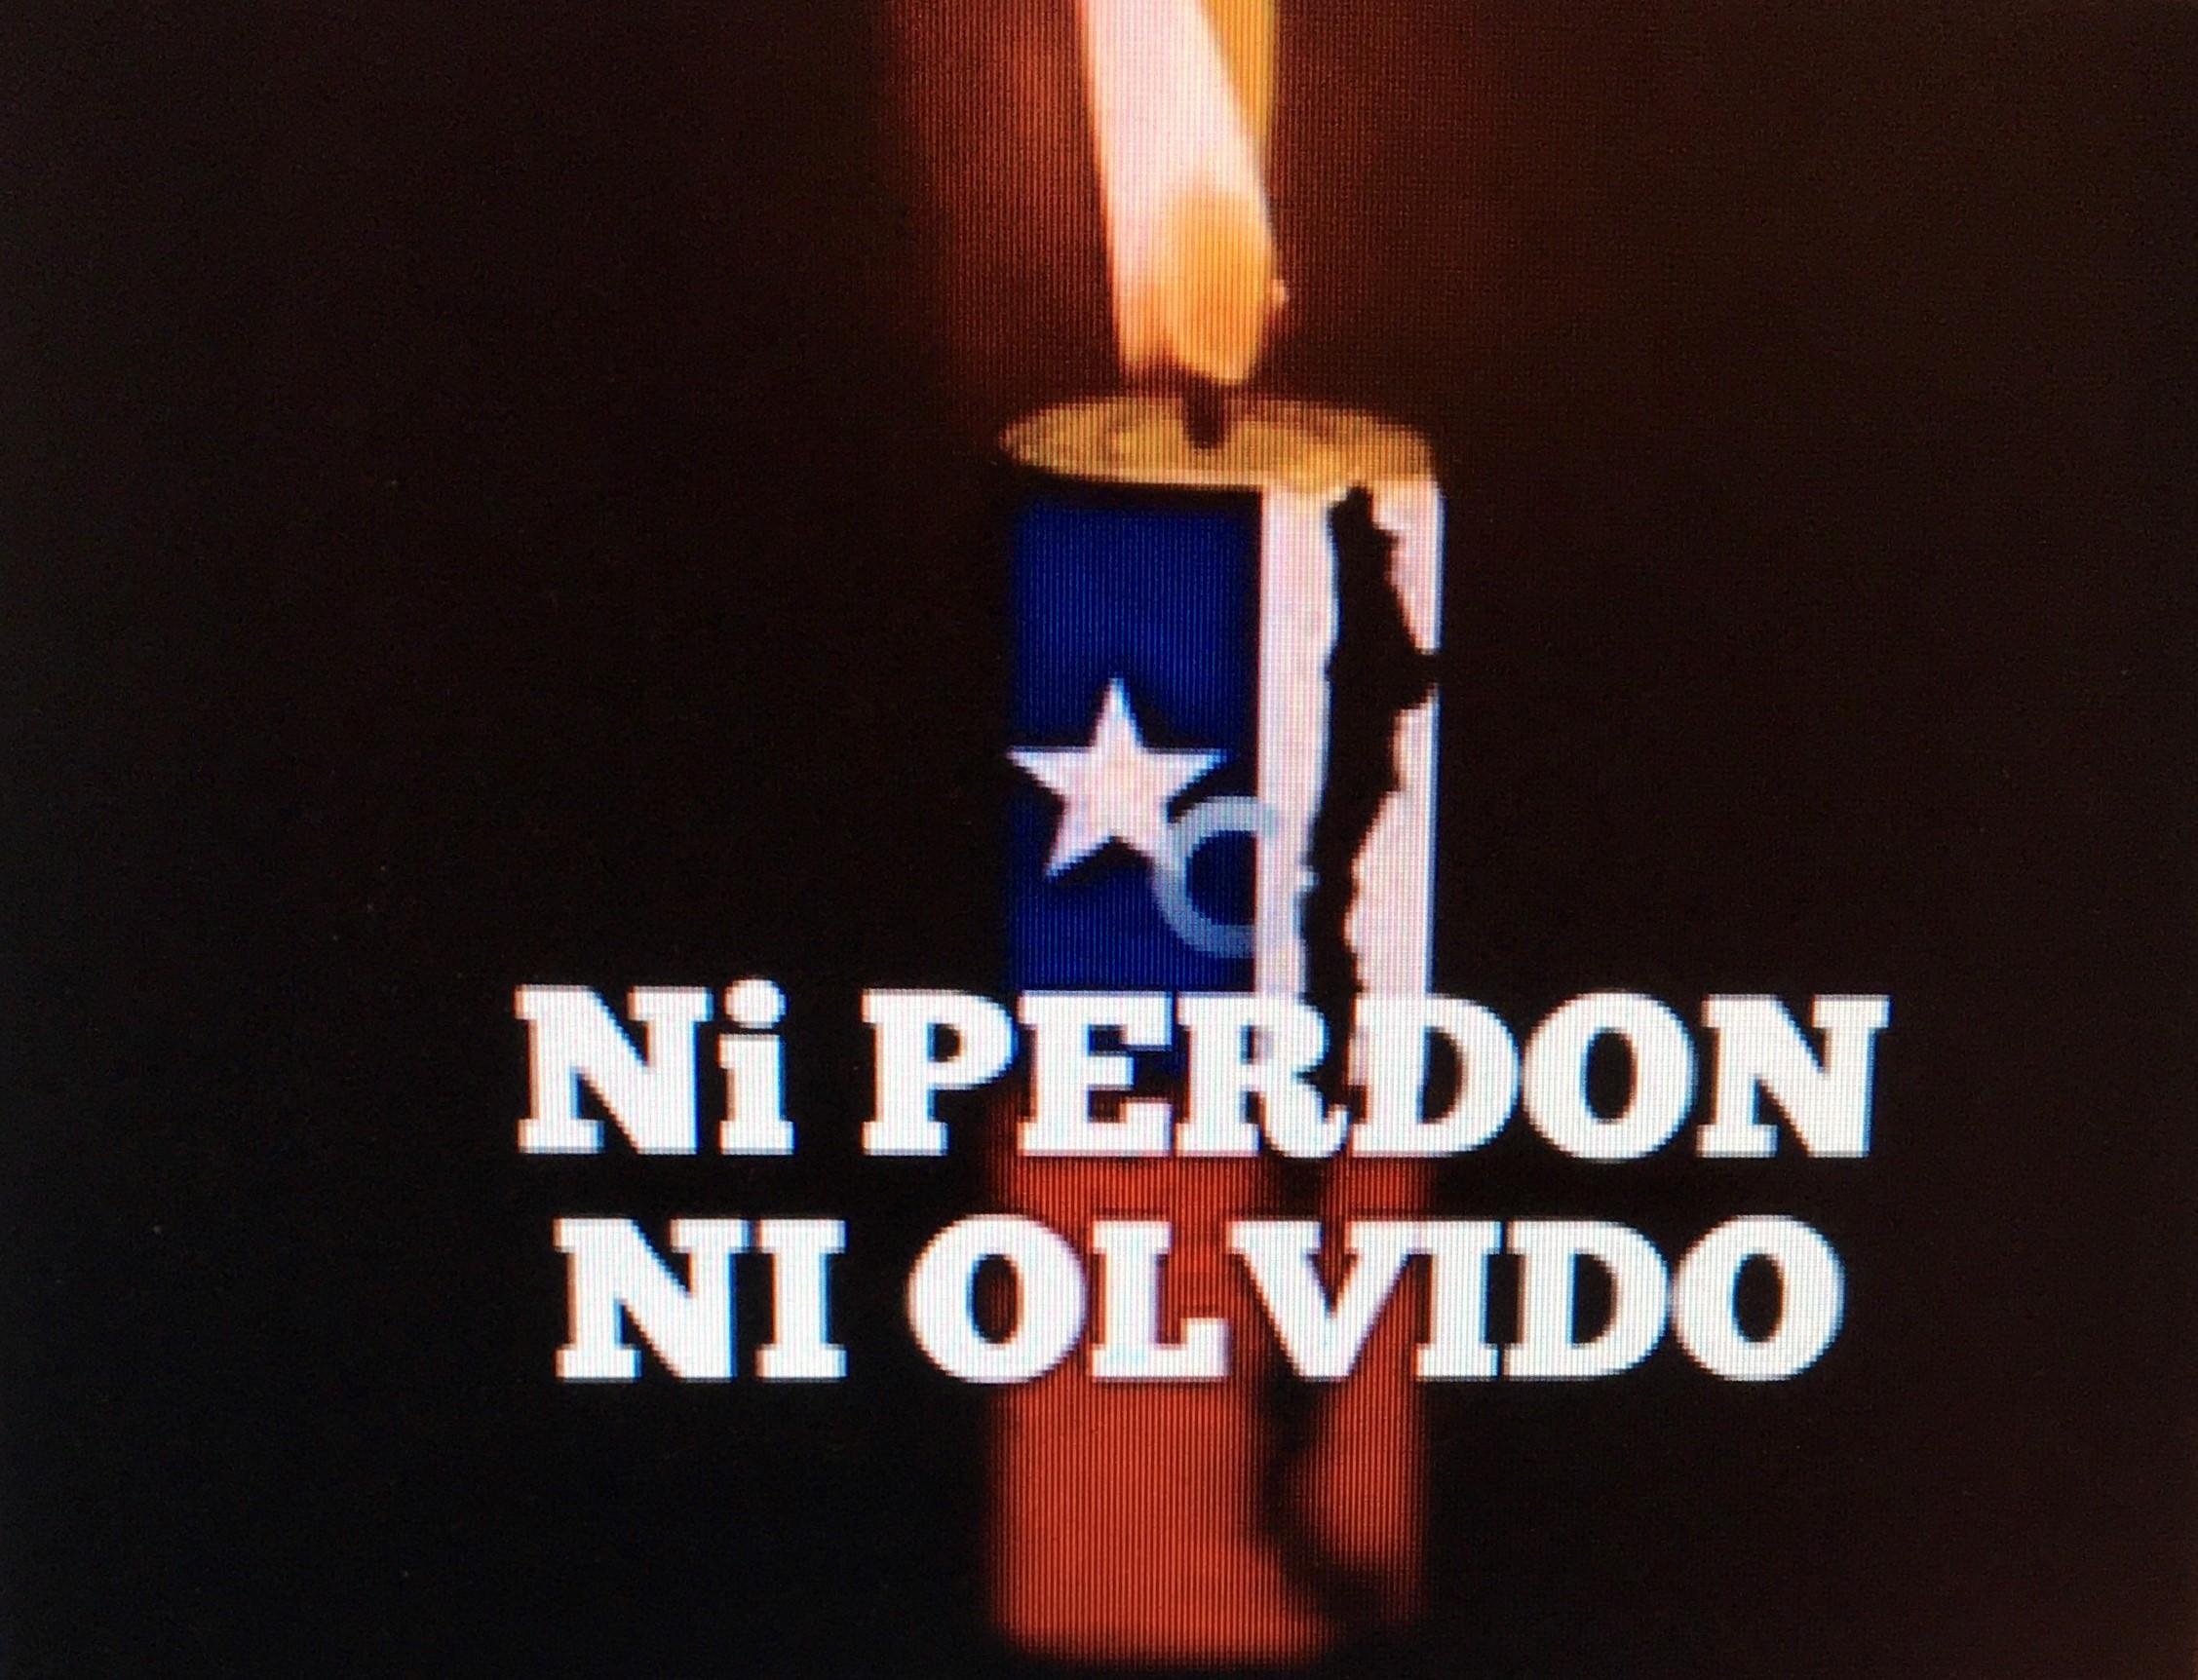 Chile ljus